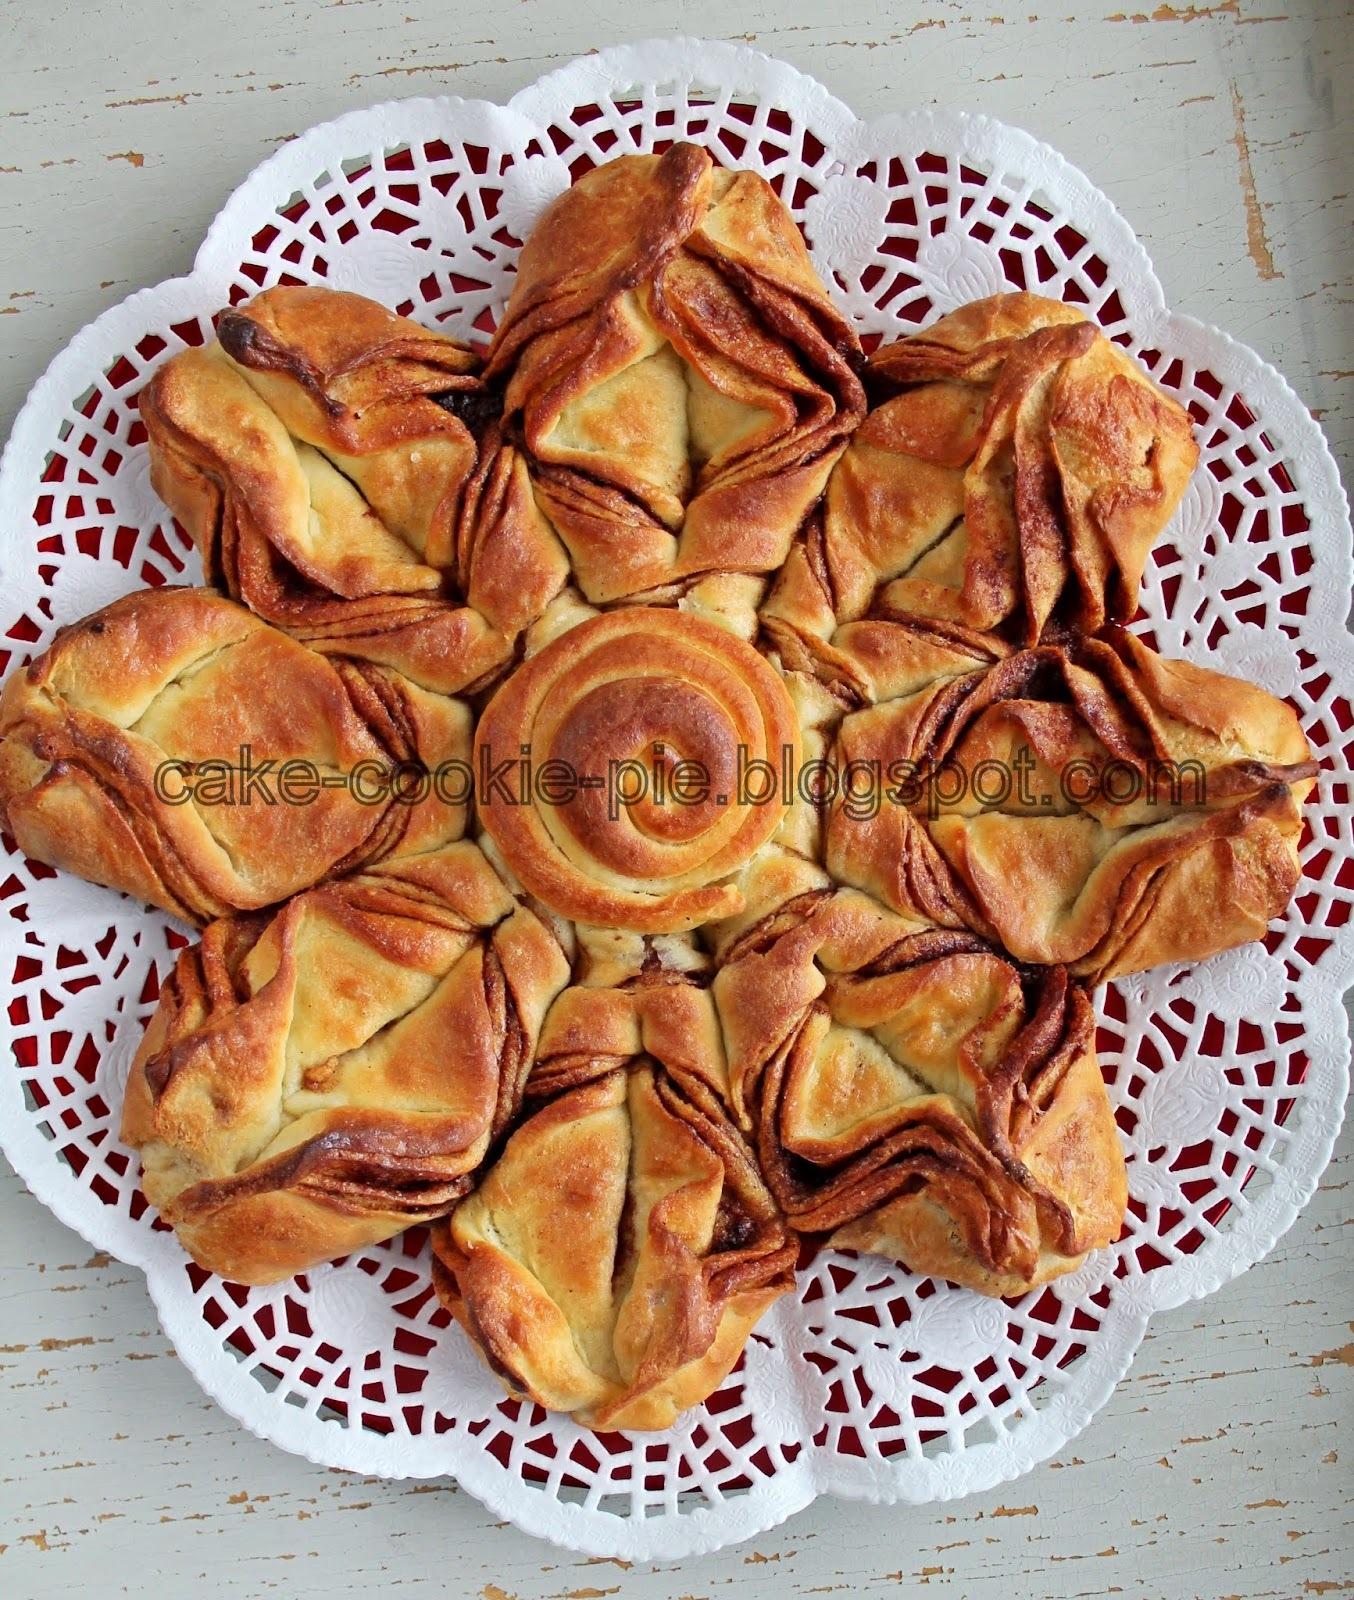 Daring Bakers February 2014 - Beautiful bread challenge